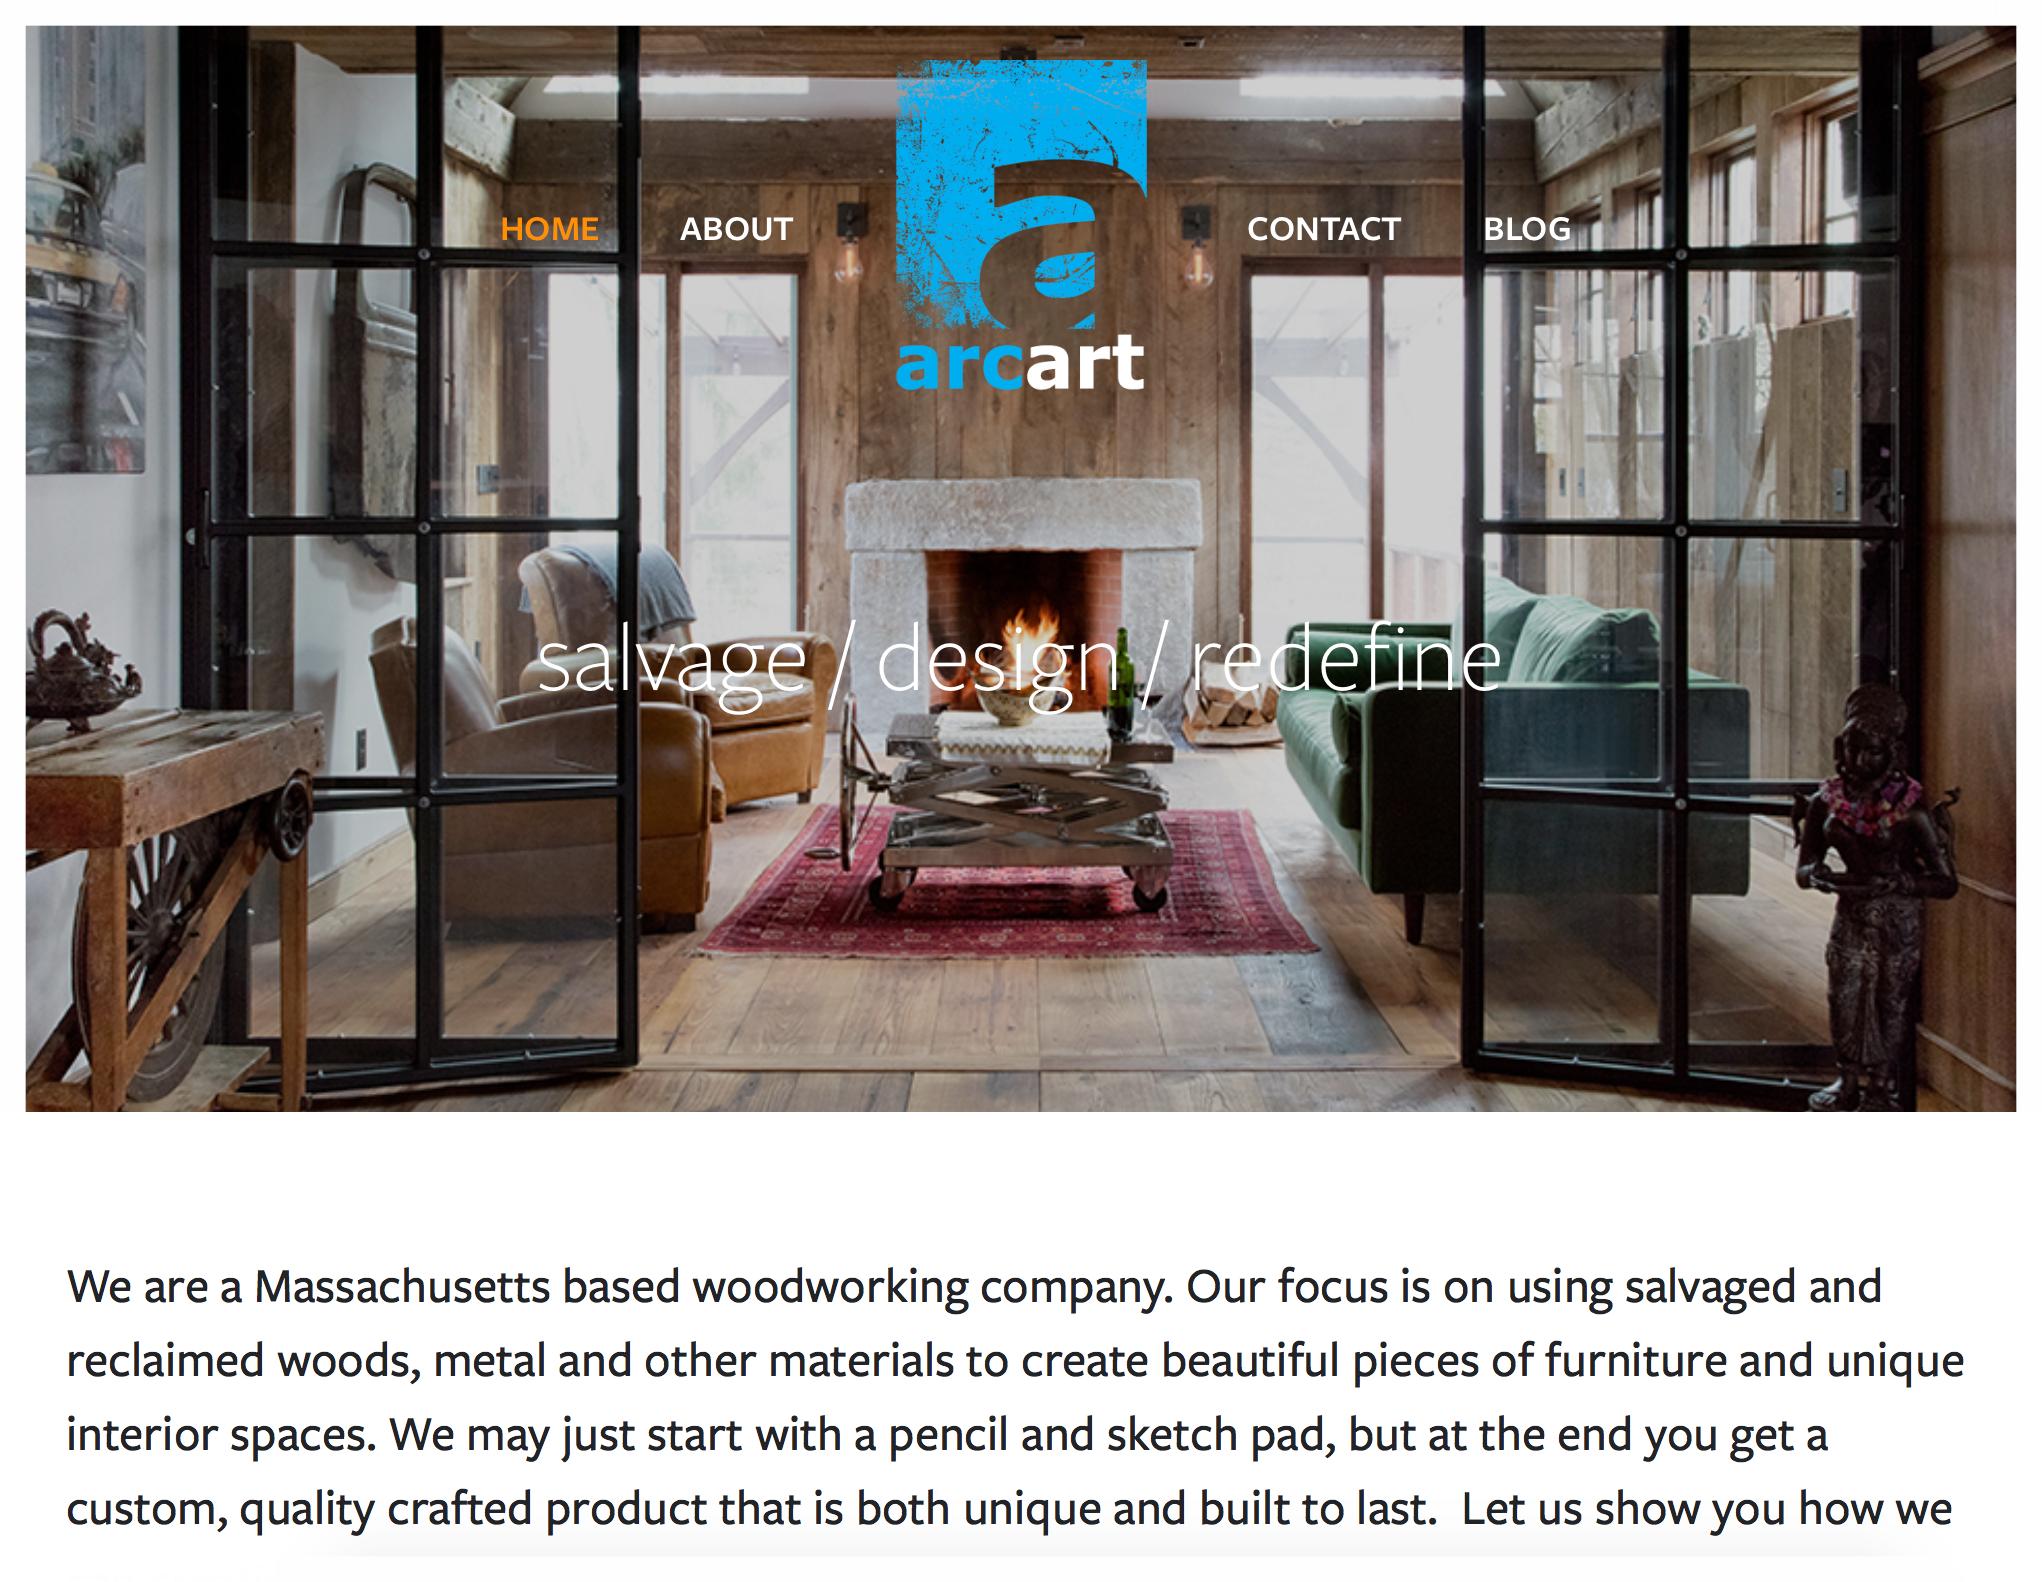 ArcArt Furniture